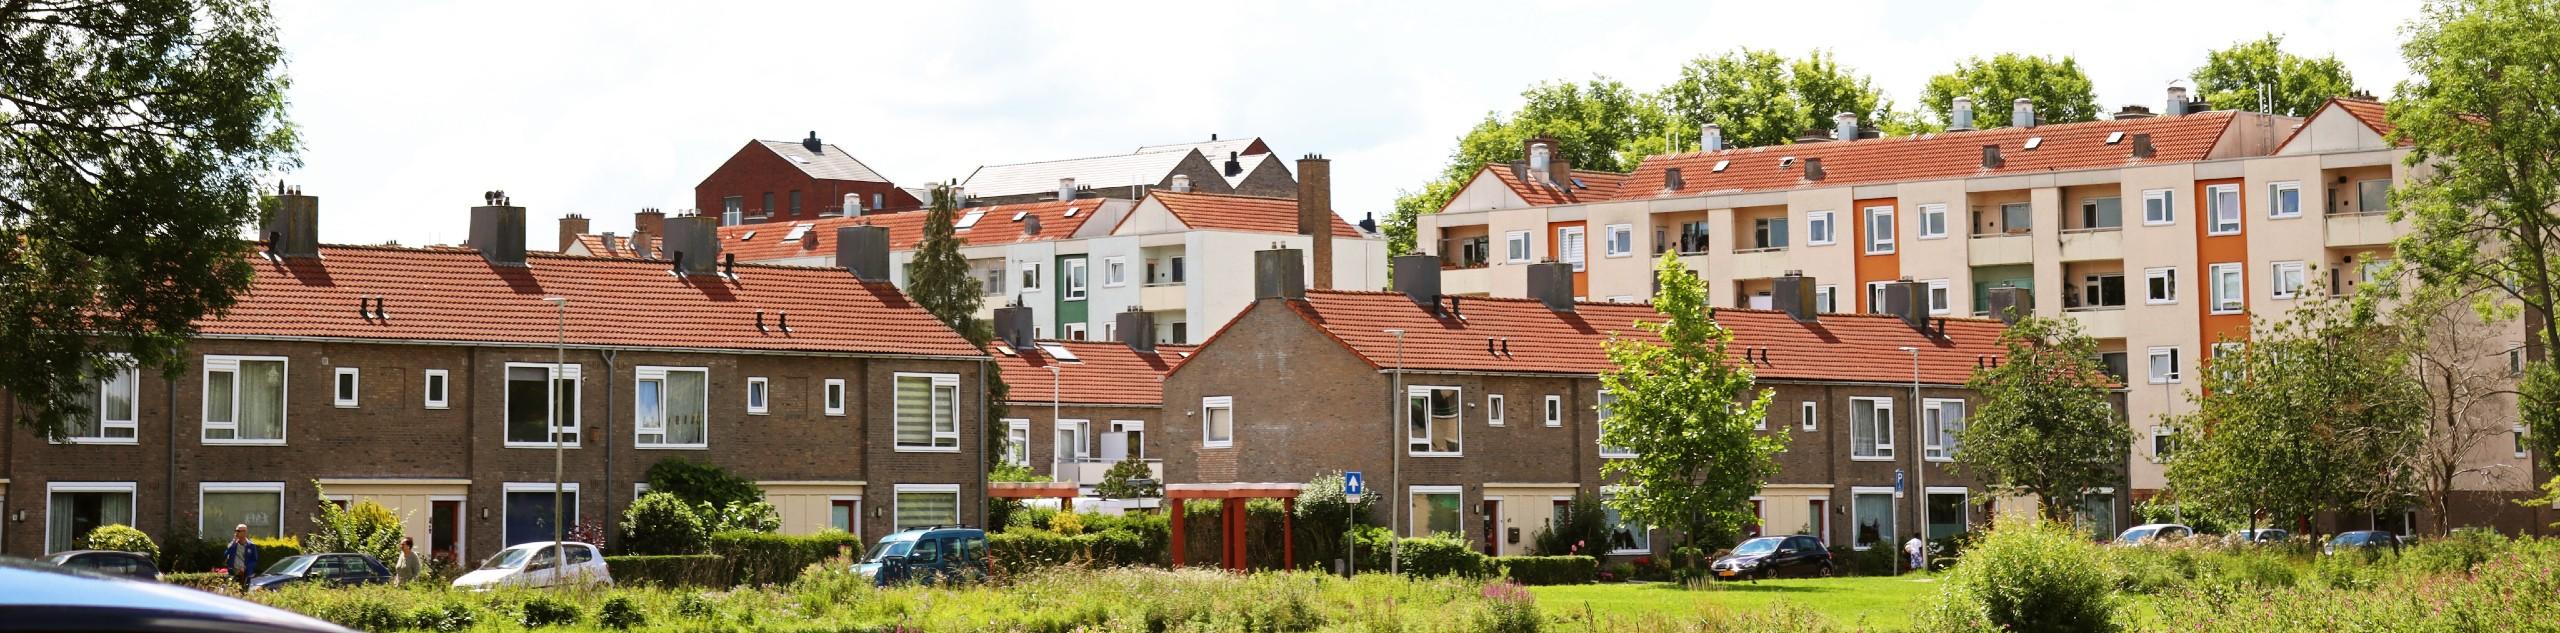 Small town in Utrecht, Netherlands